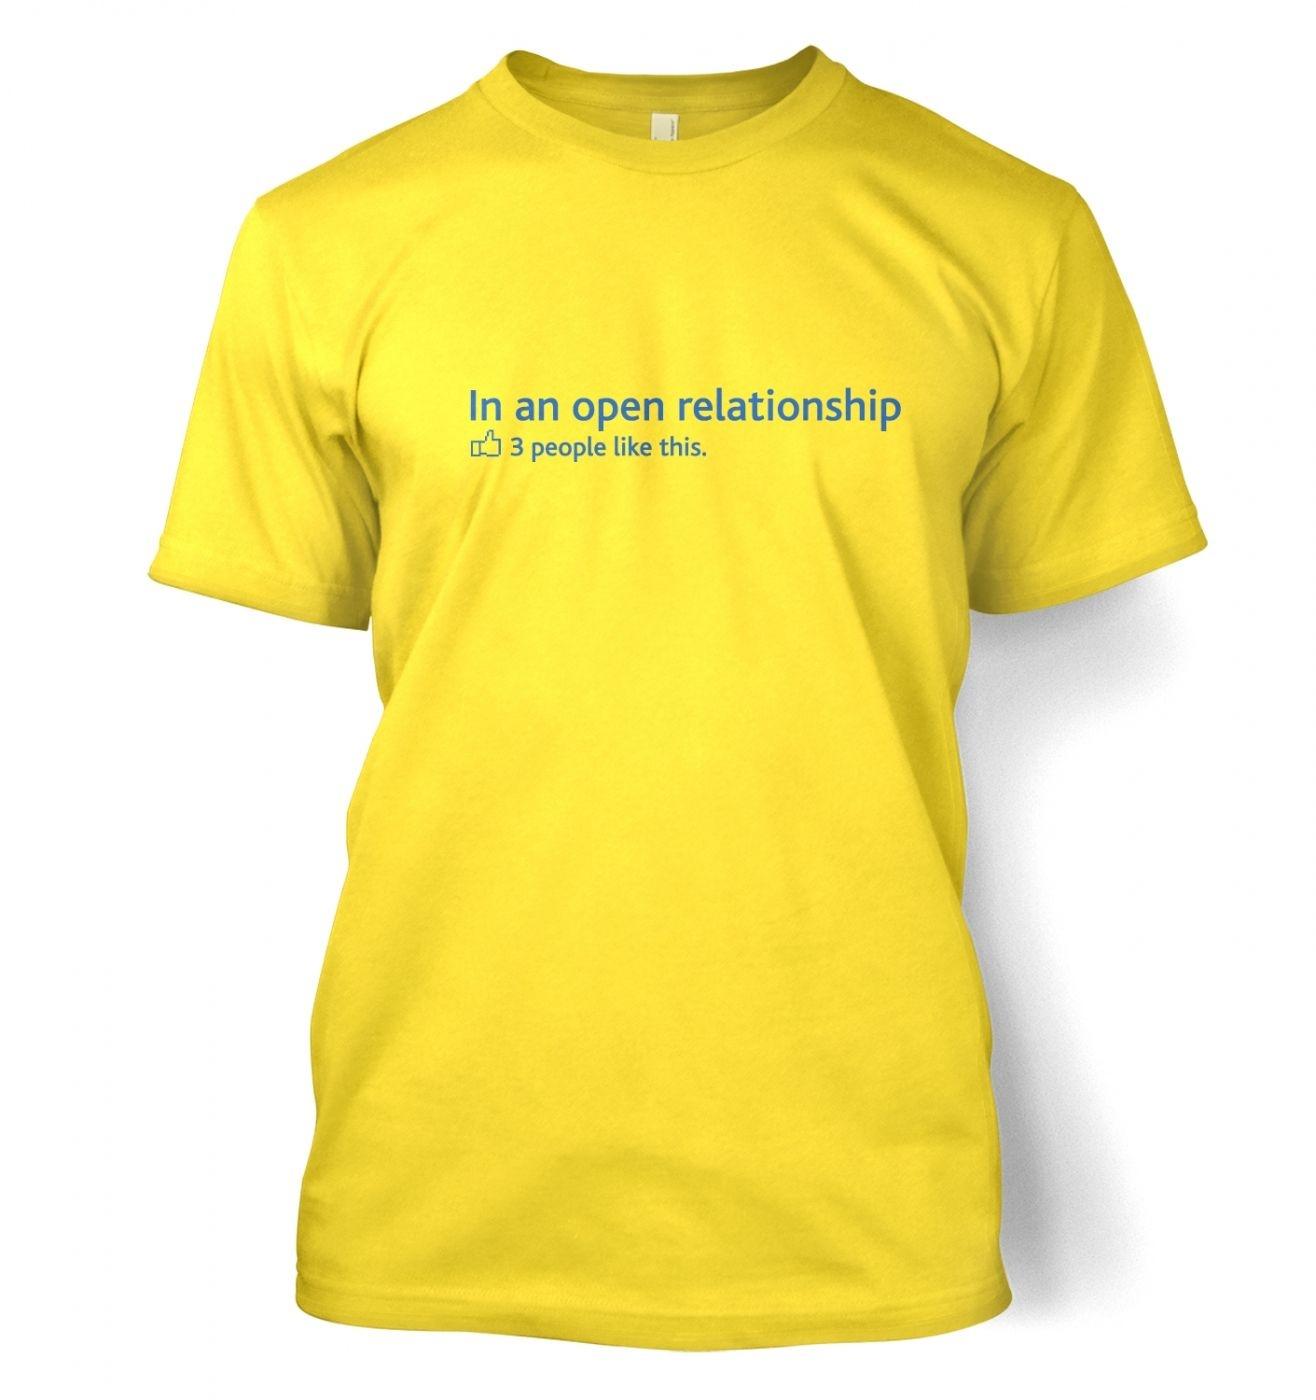 In an open relationship social status t-shirt